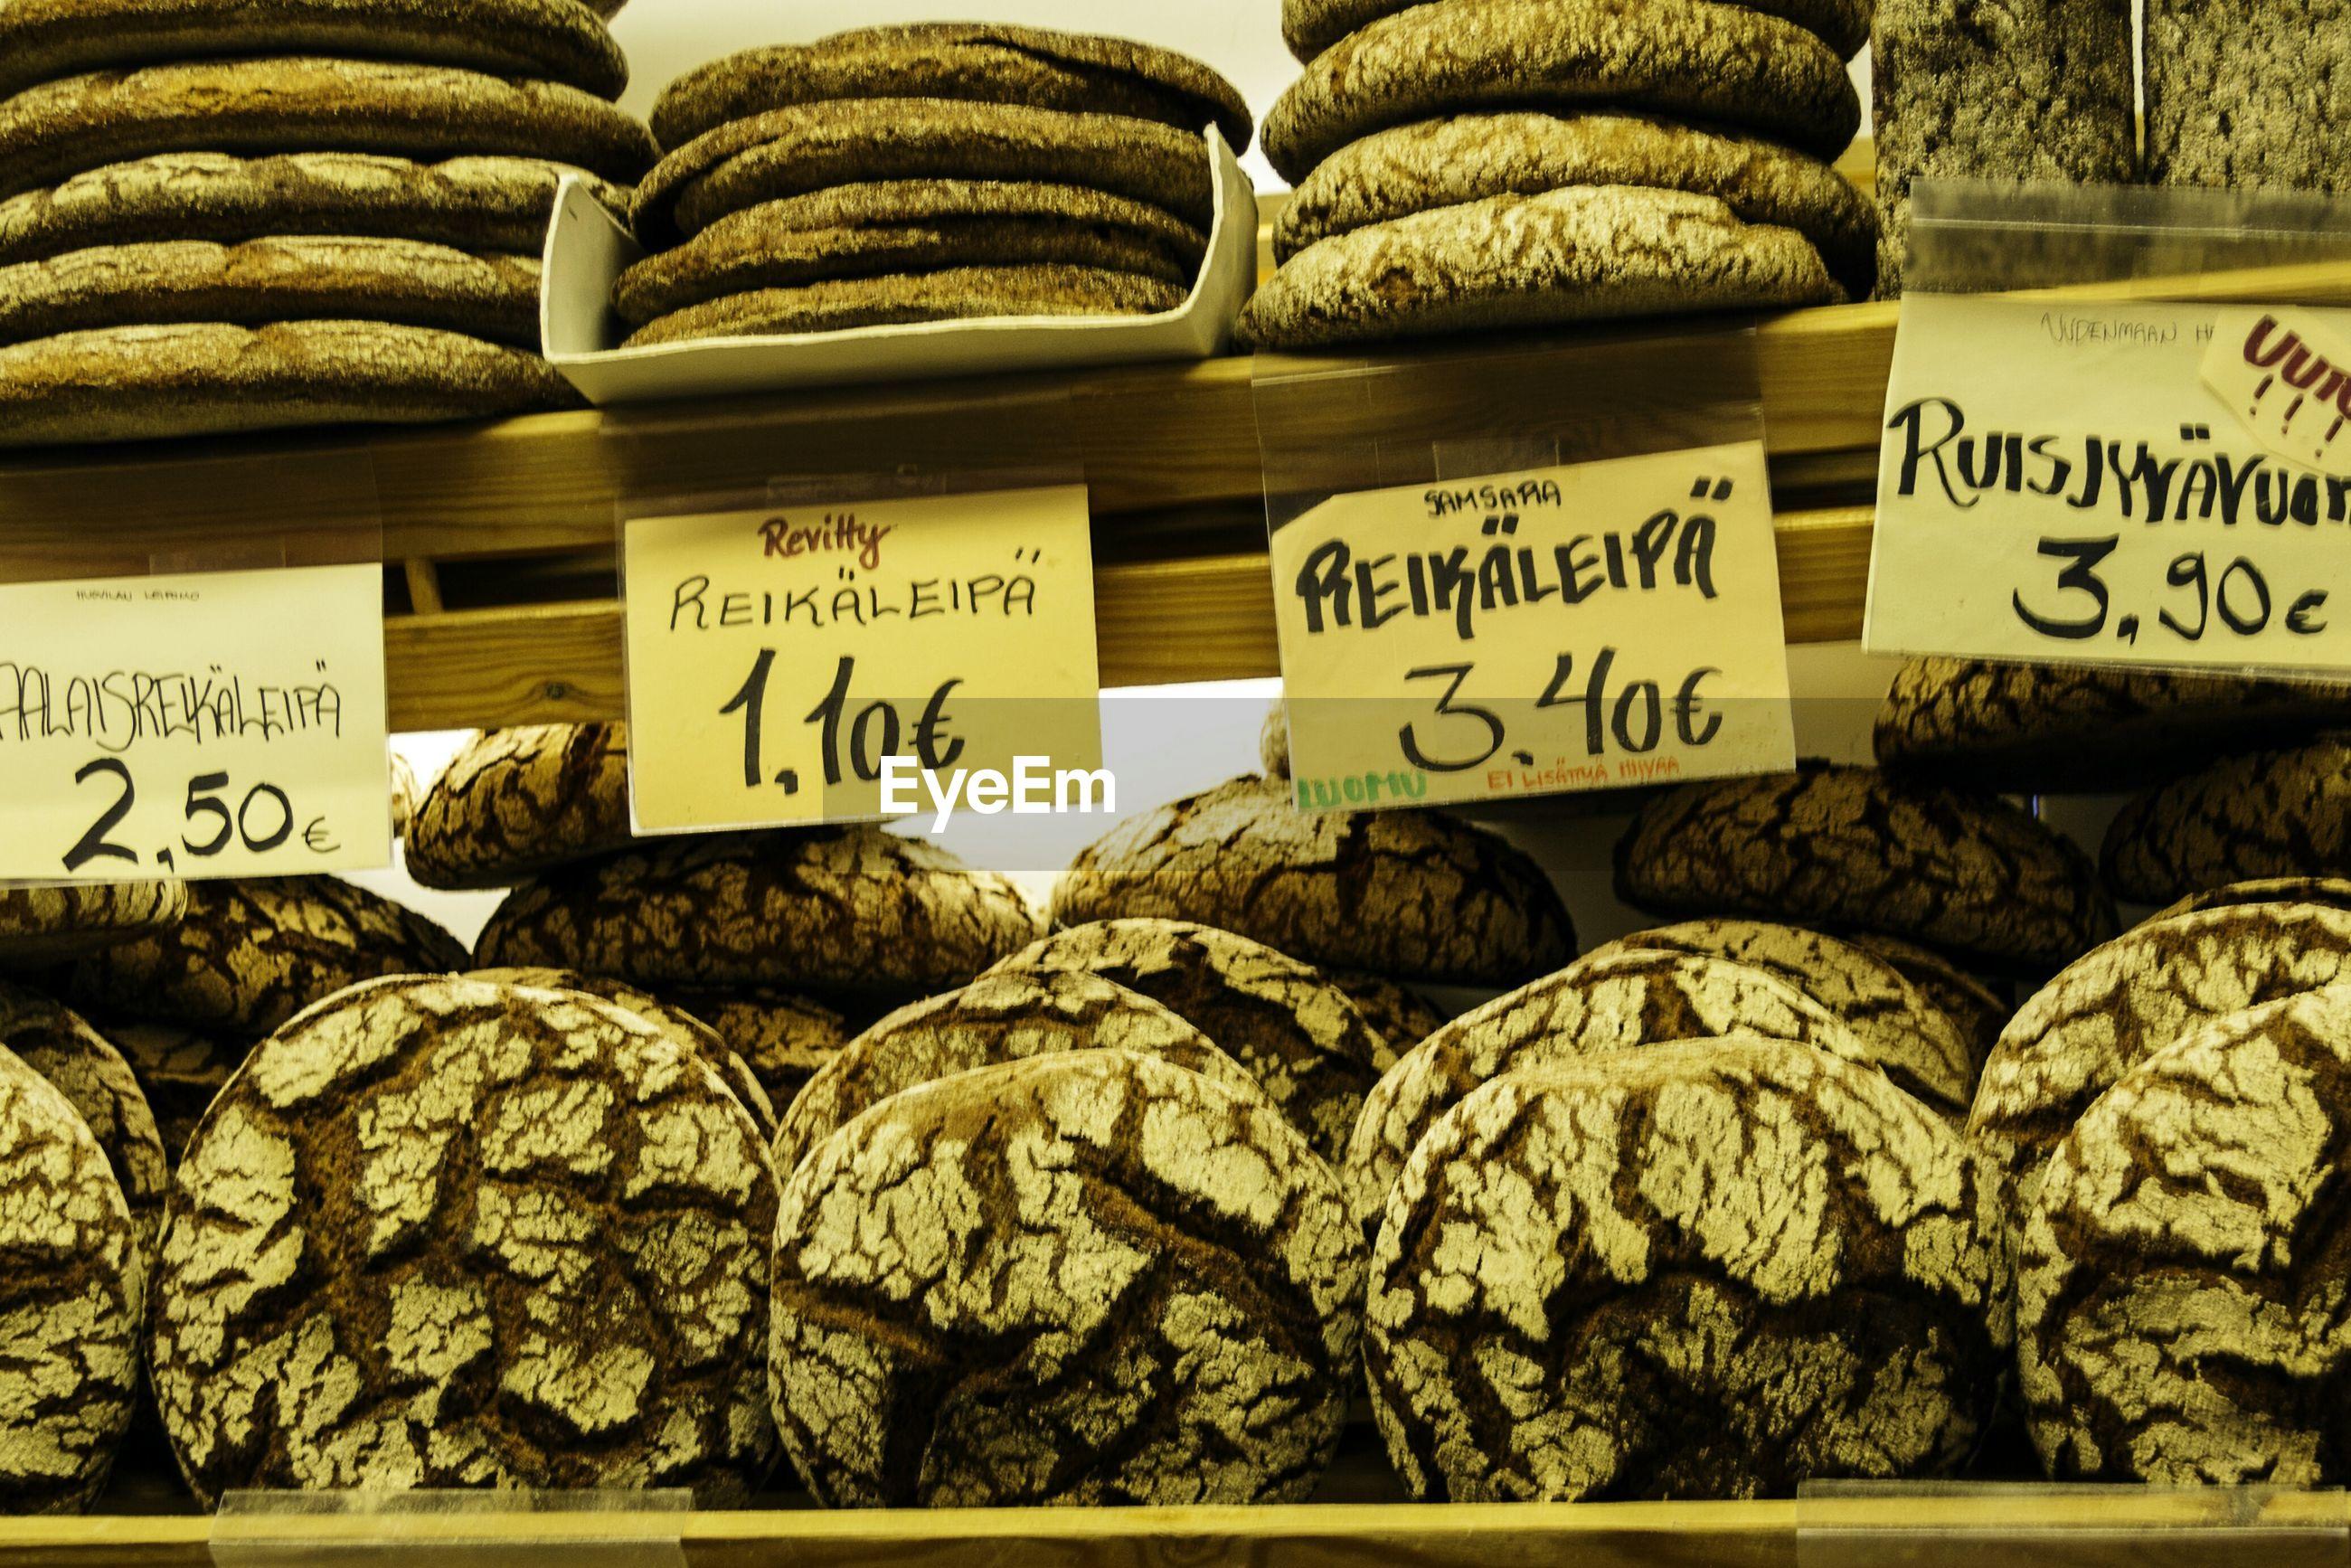 Sourdough breads for sale at bakery shop